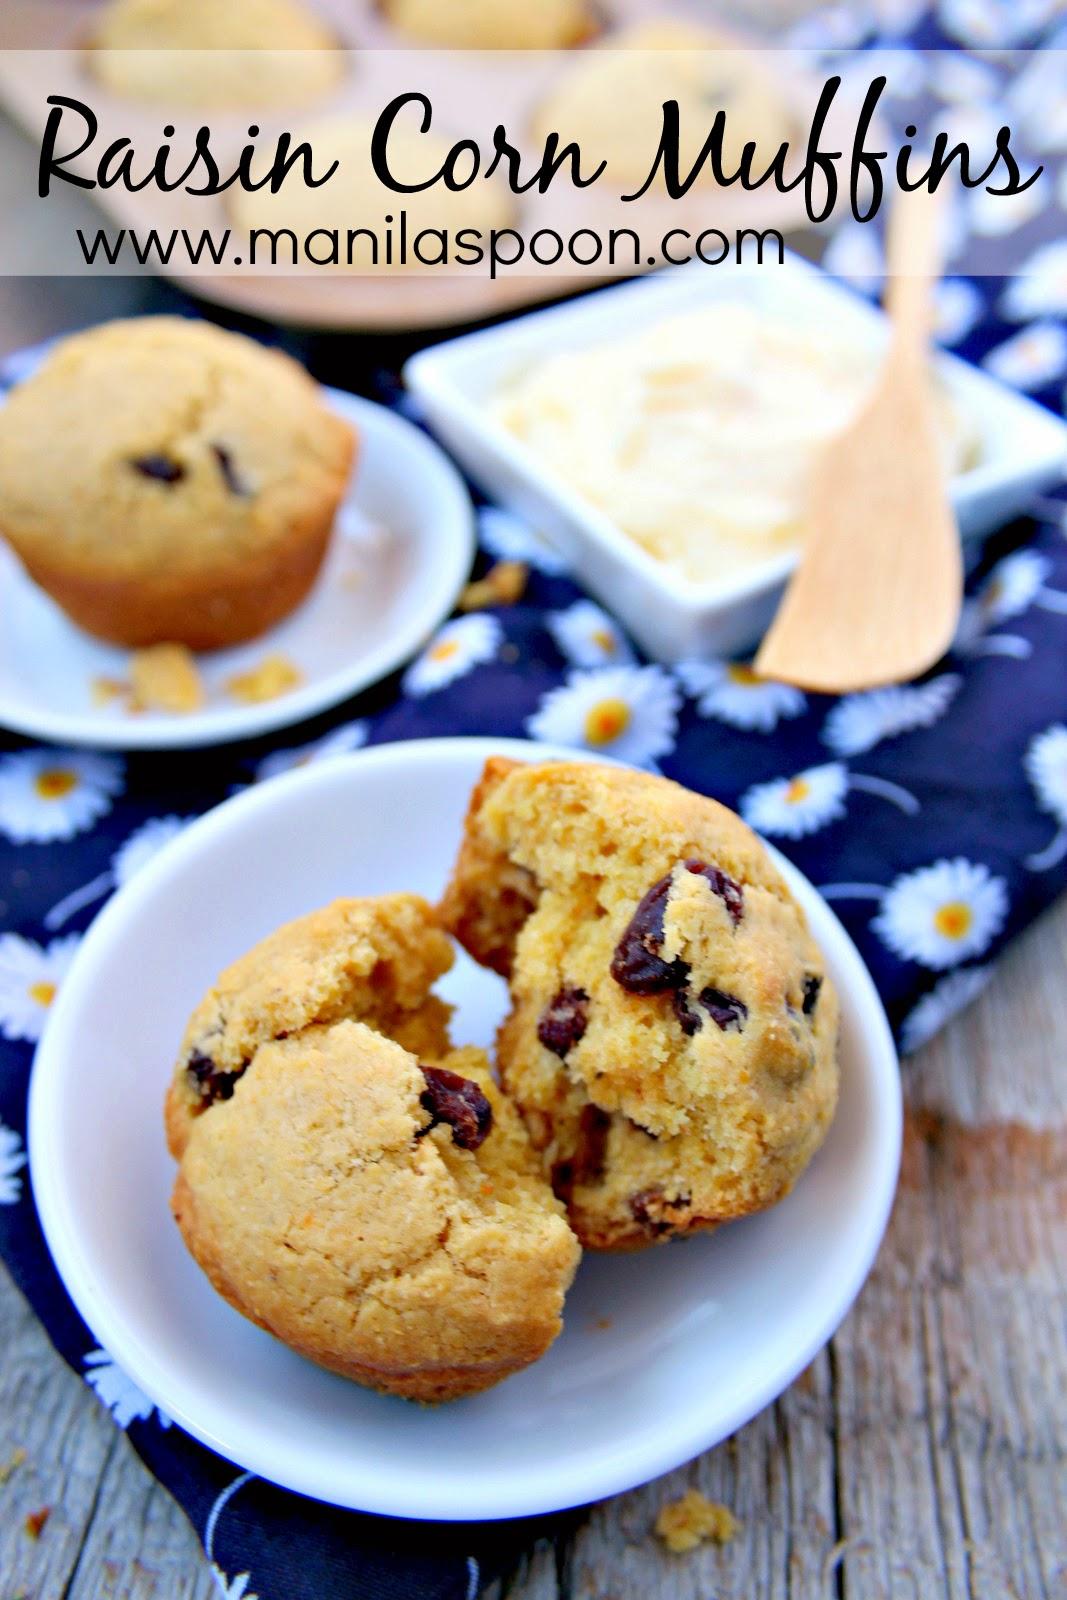 Raisin Corn Muffins